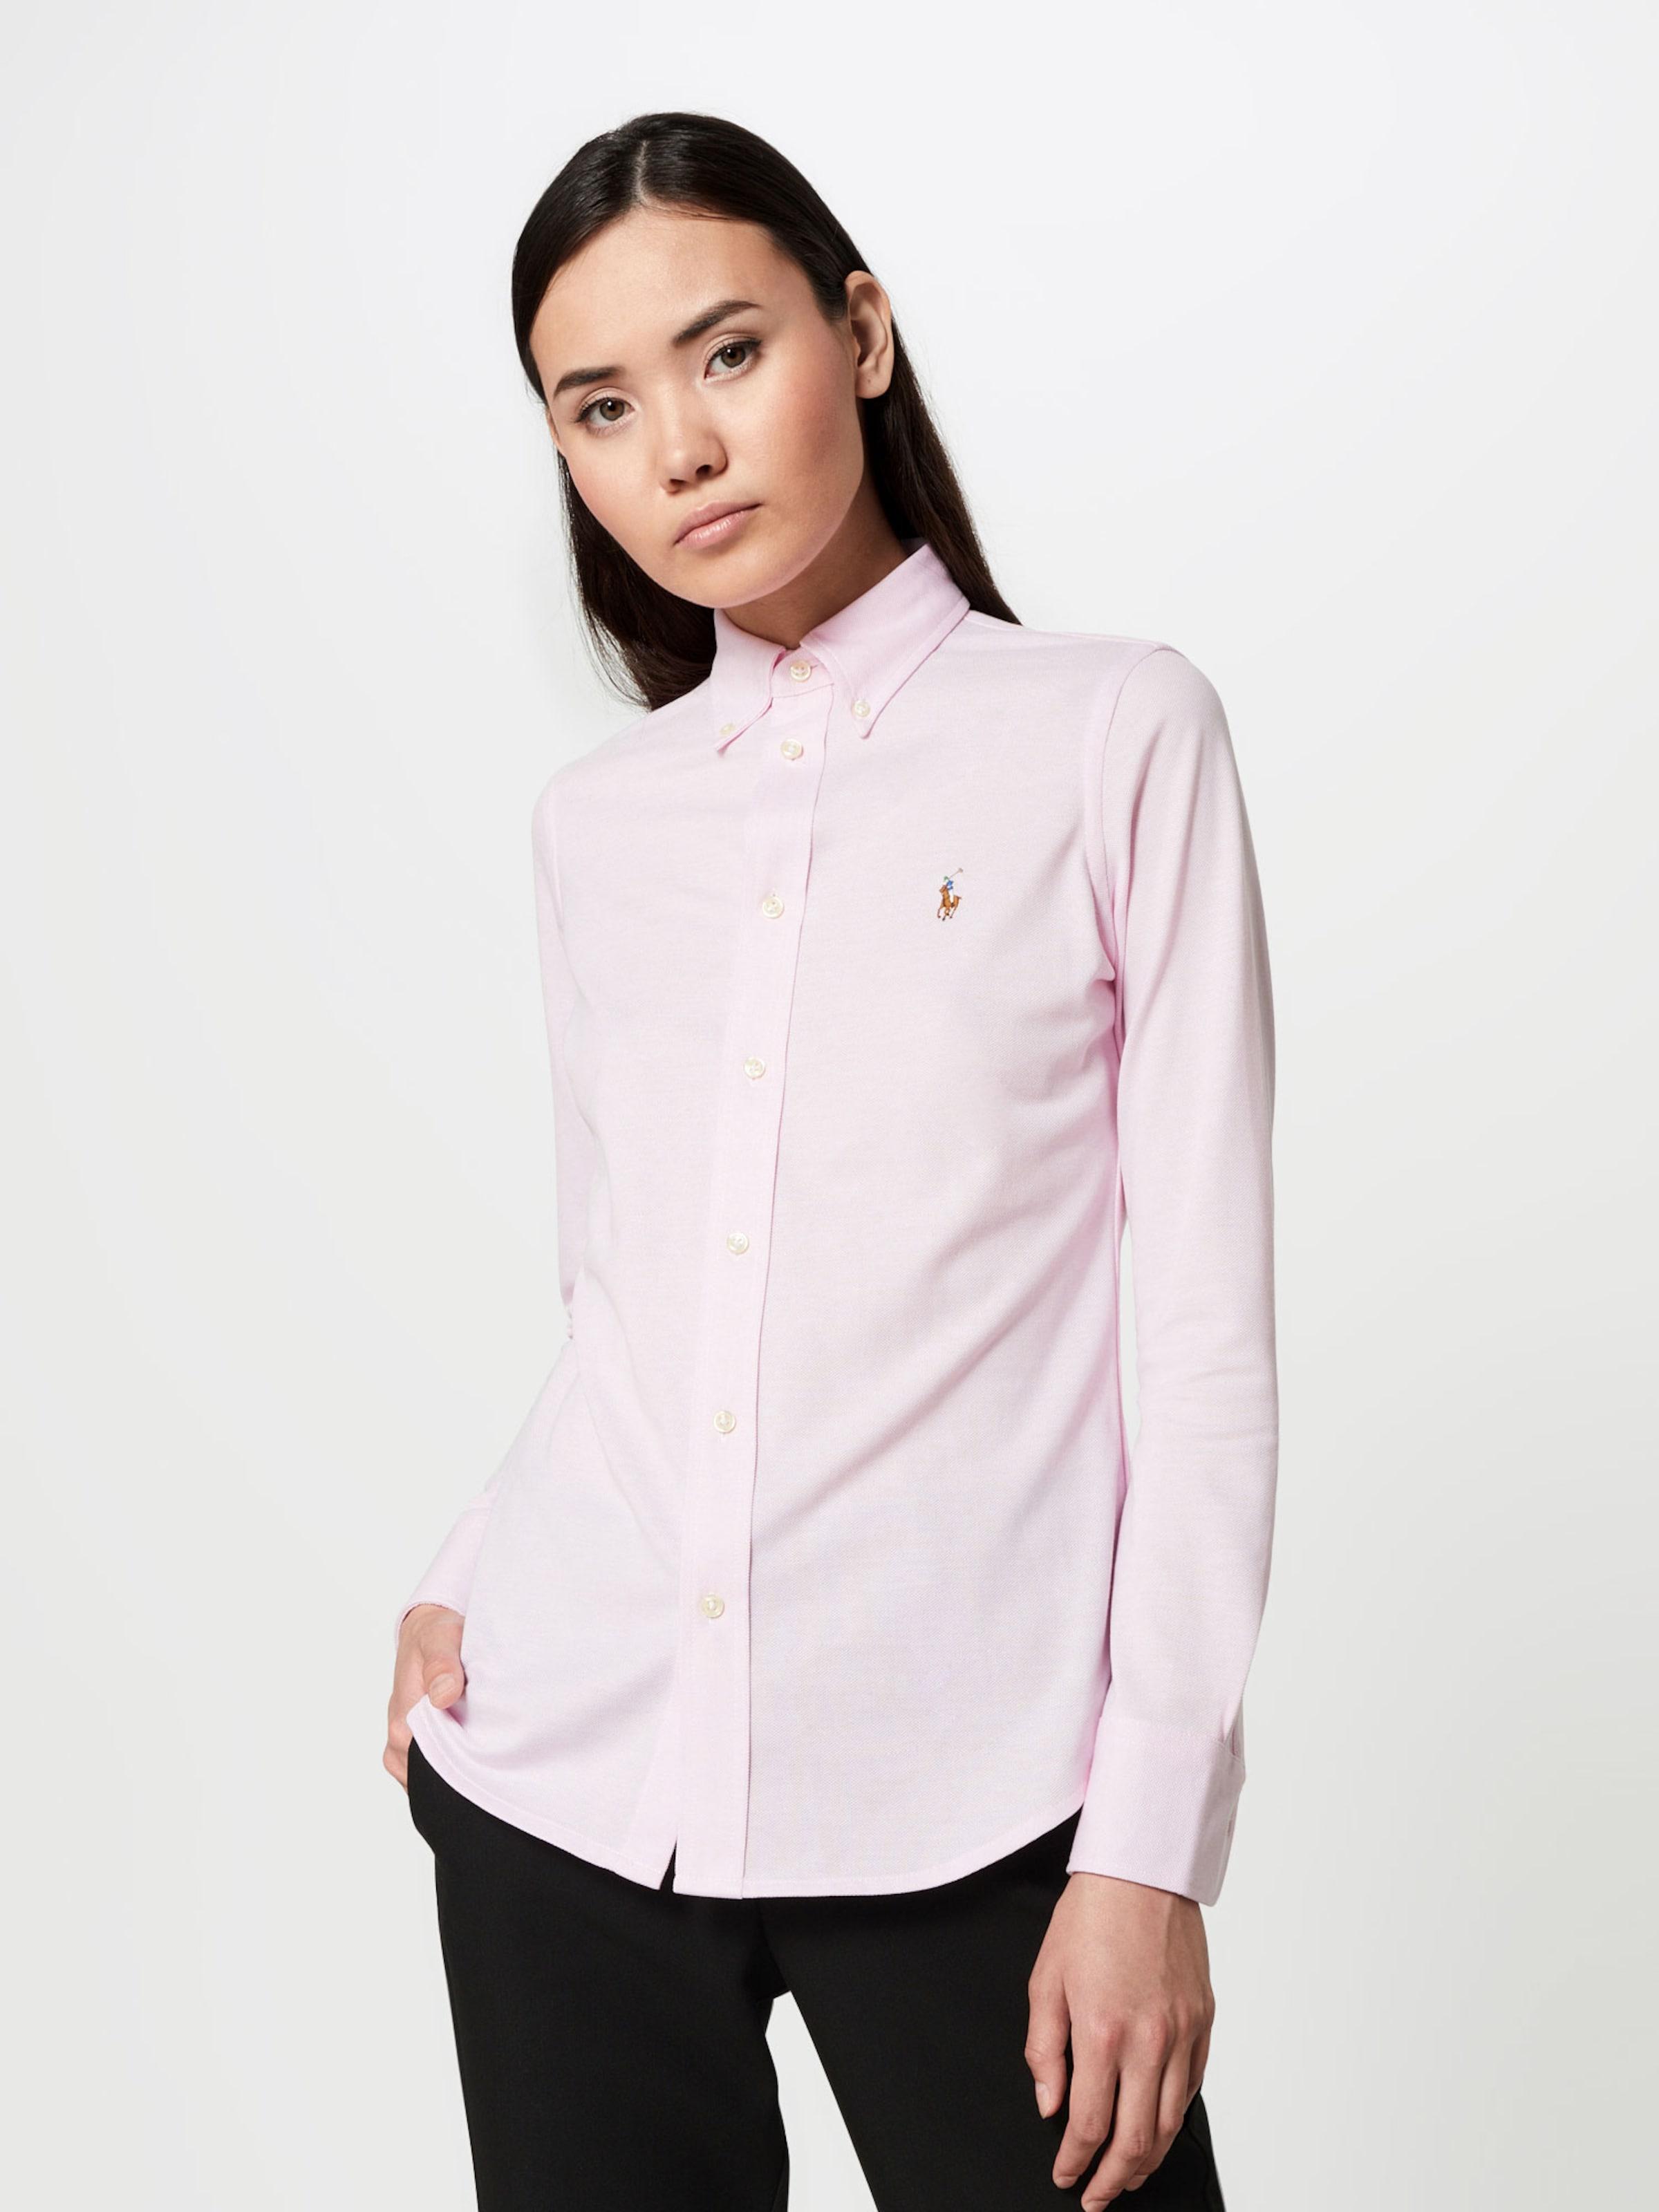 Ralph Bluse Lauren 'heidi' Polo In Rosa f7Ibg6Yyv